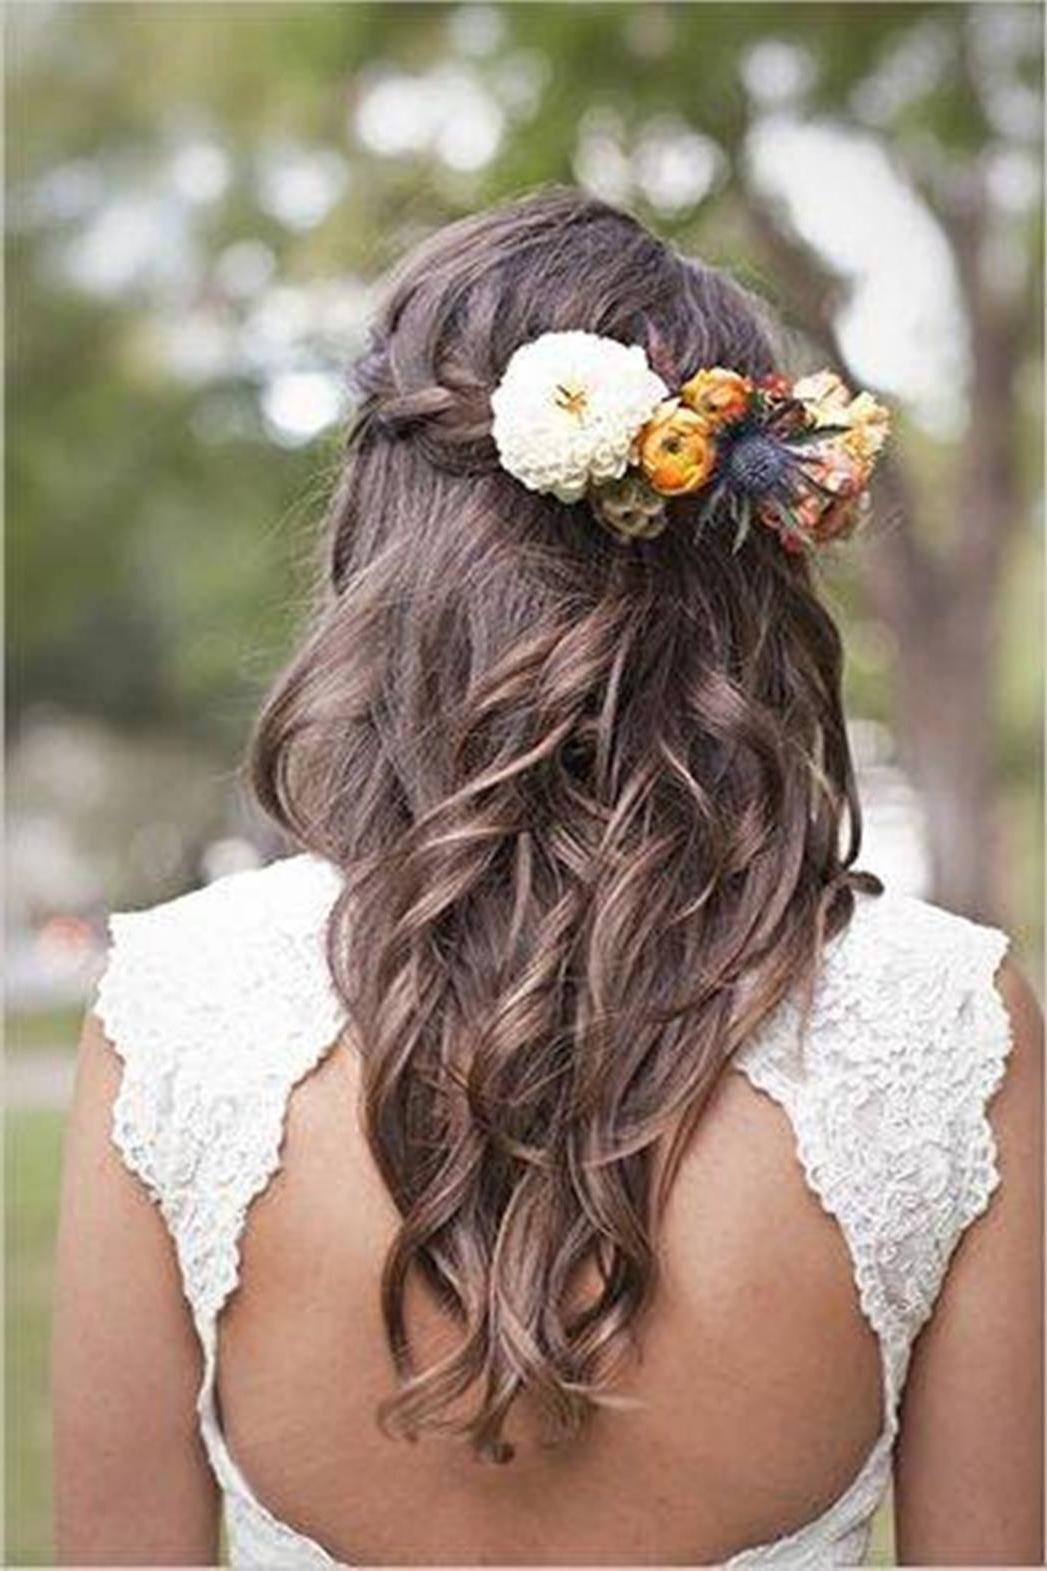 Most Popular Braided Wedding Hairstyles Pertaining To Braid Hairstyles For Wedding Black Styles Side Bridal Box Weddings (View 11 of 15)